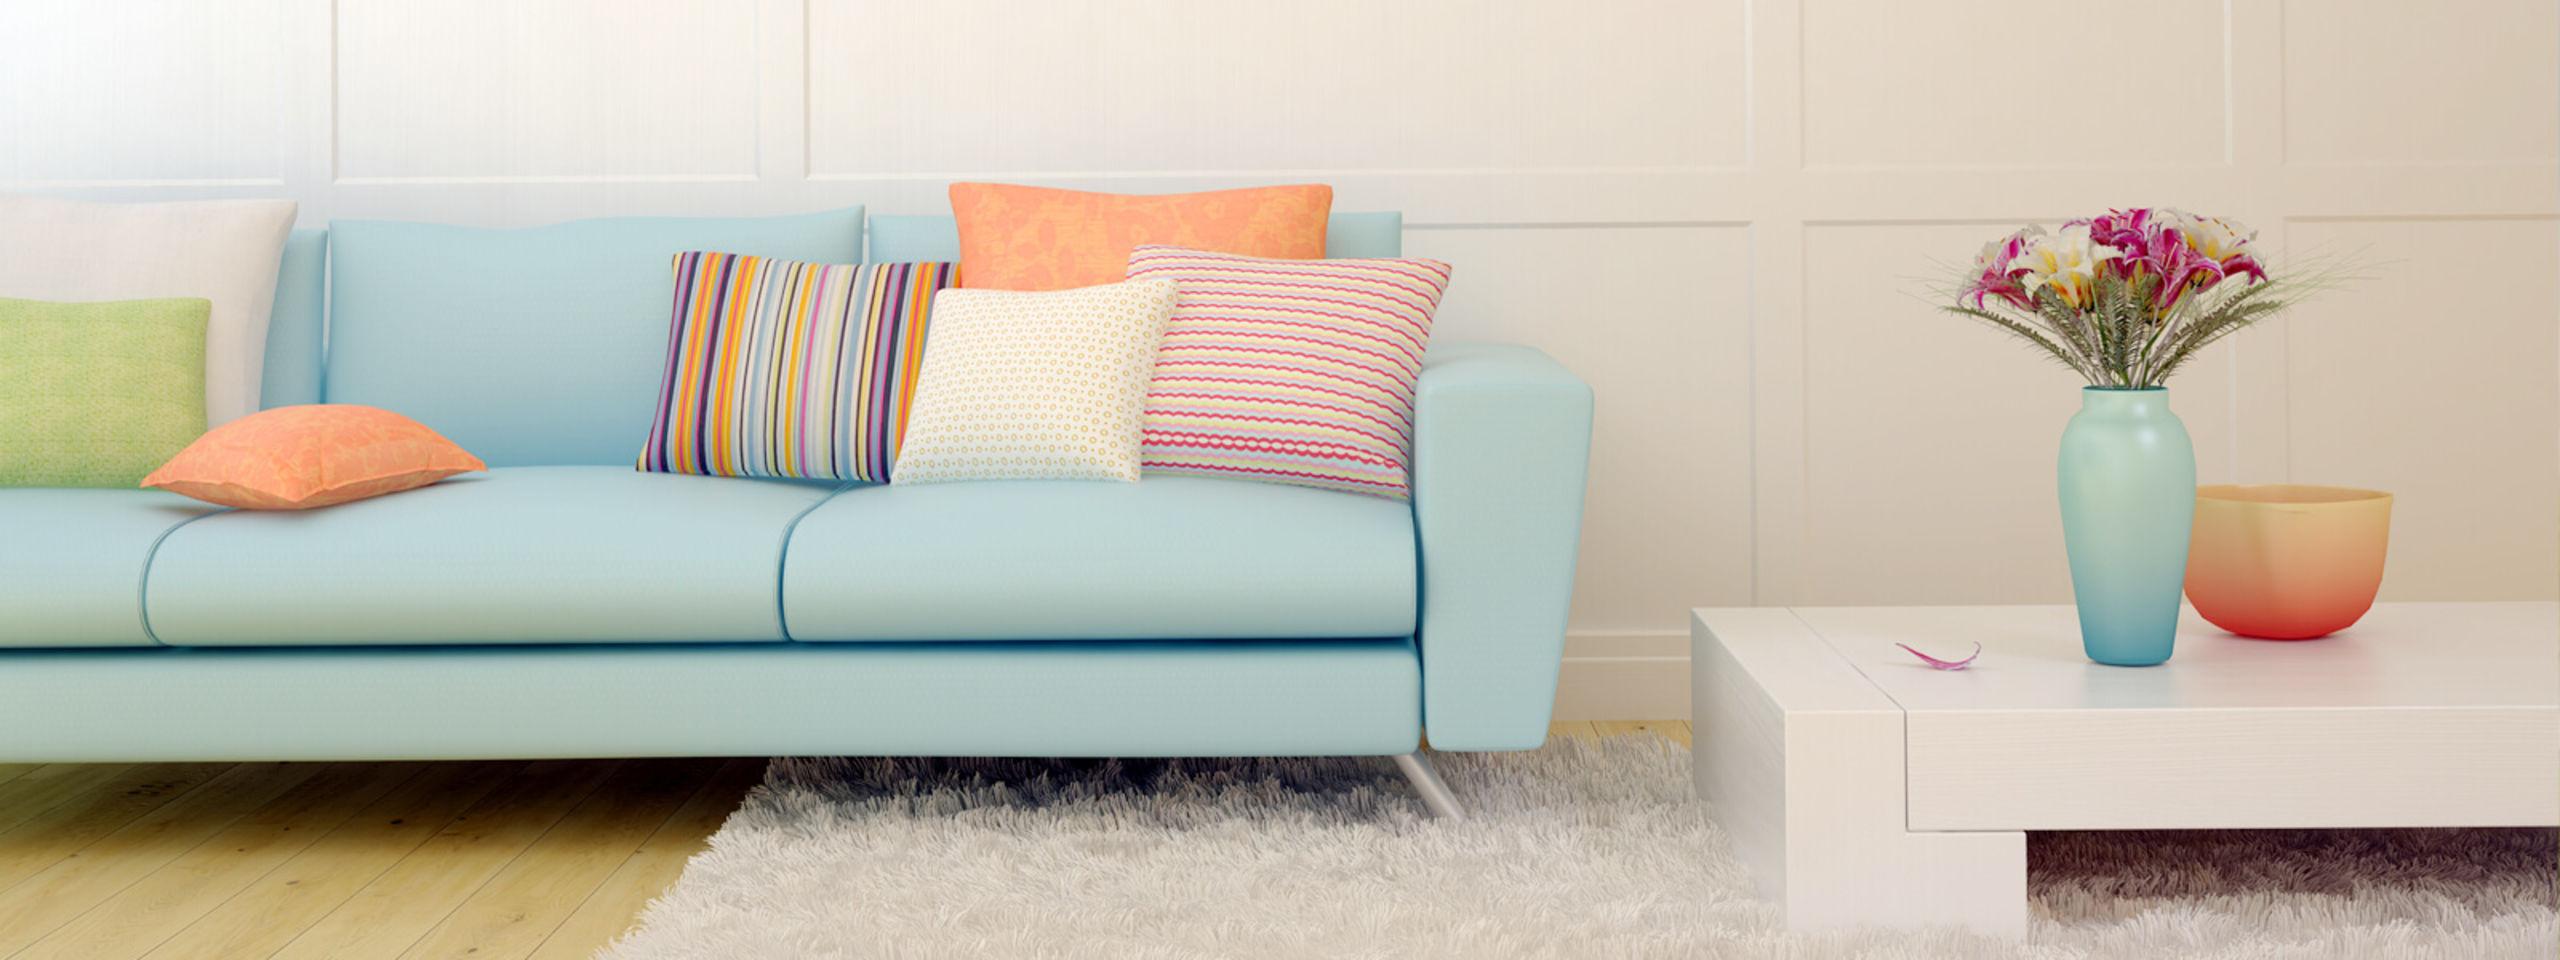 Get comfy and cozy